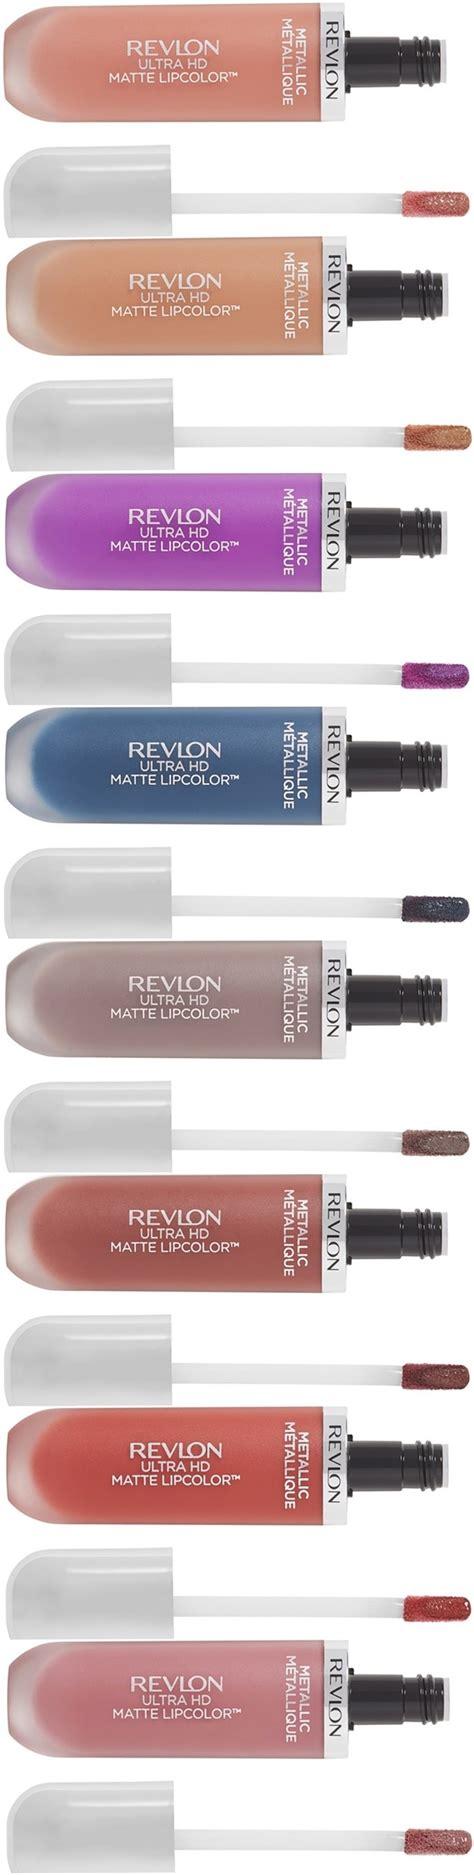 Revlon Ultra Hd Matte Lipcolor Metallic 710 Dazzle Eclat revlon ultra hd matte metallic lipcolor for summer 2017 musings of a muse bloglovin